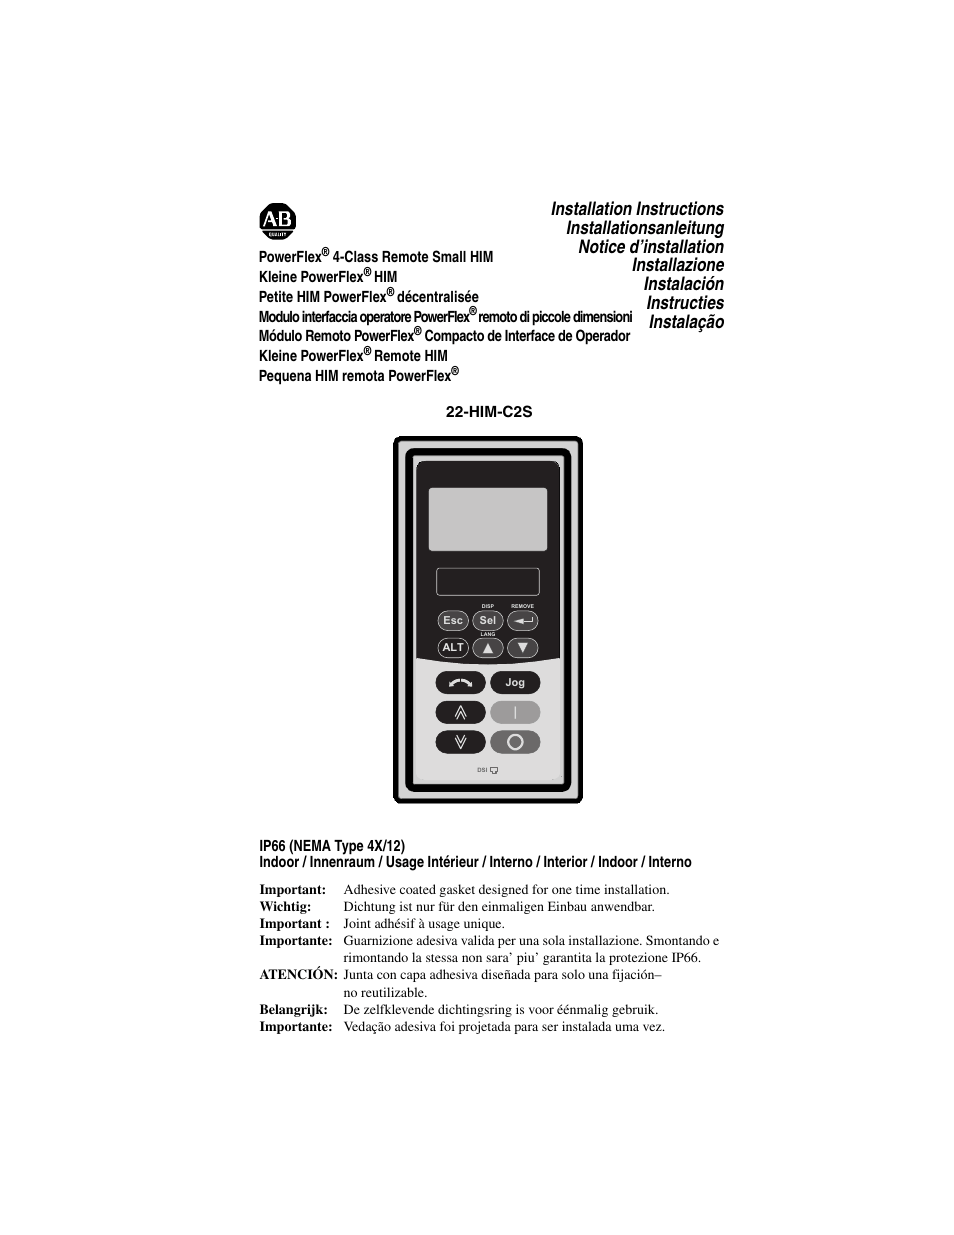 Rockwell Automation 22-HIM-C2S PowerFlex 4-Class Remote